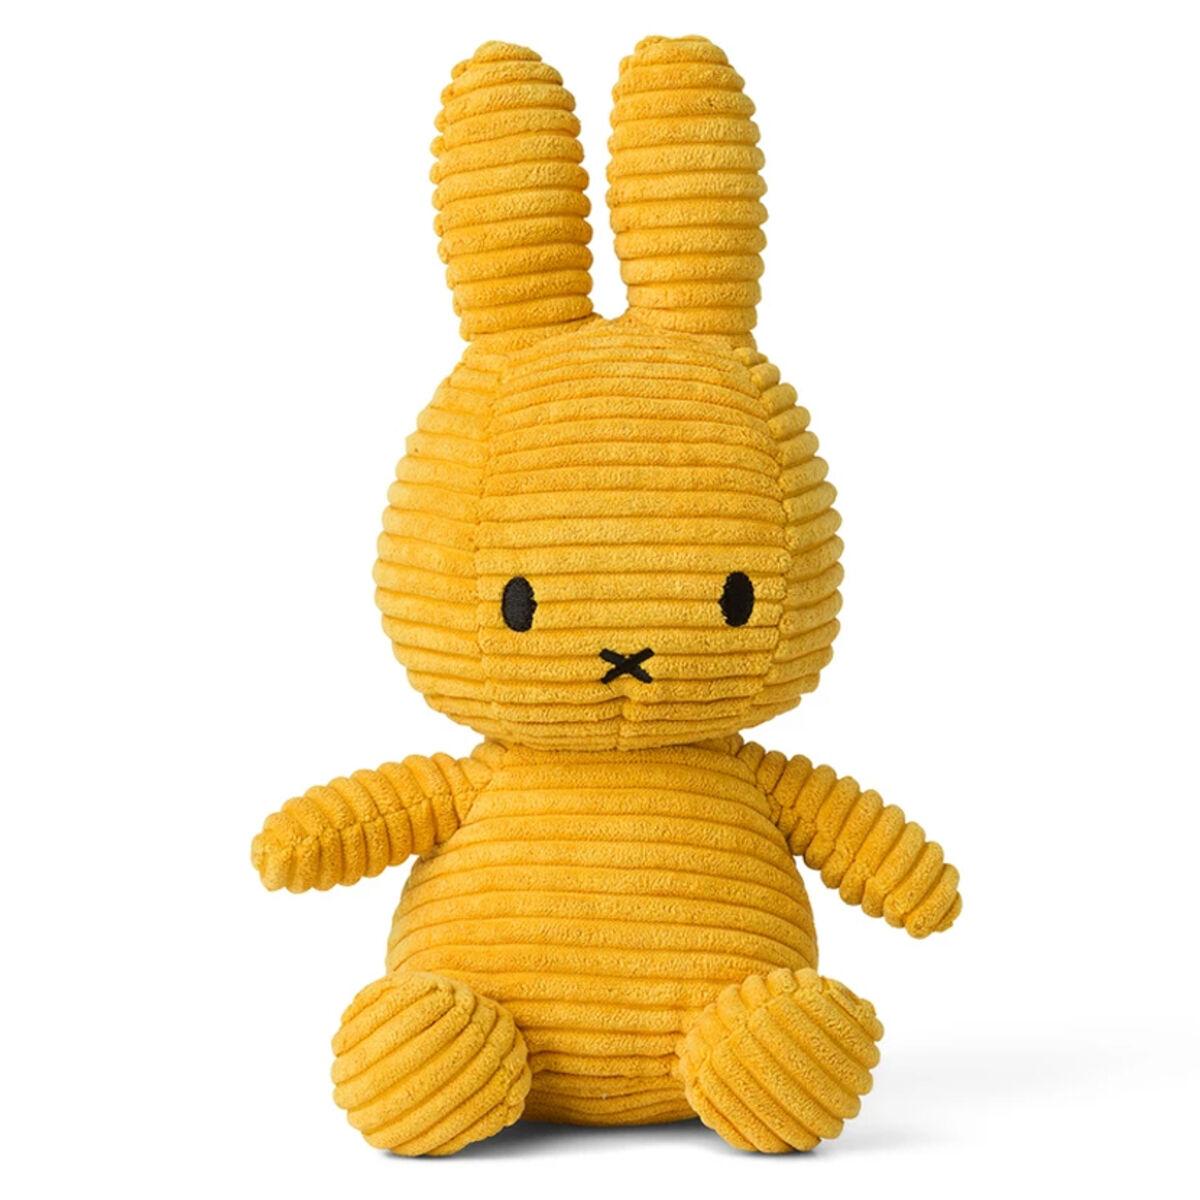 nijntje Lapin Miffy Moutarde - Petit